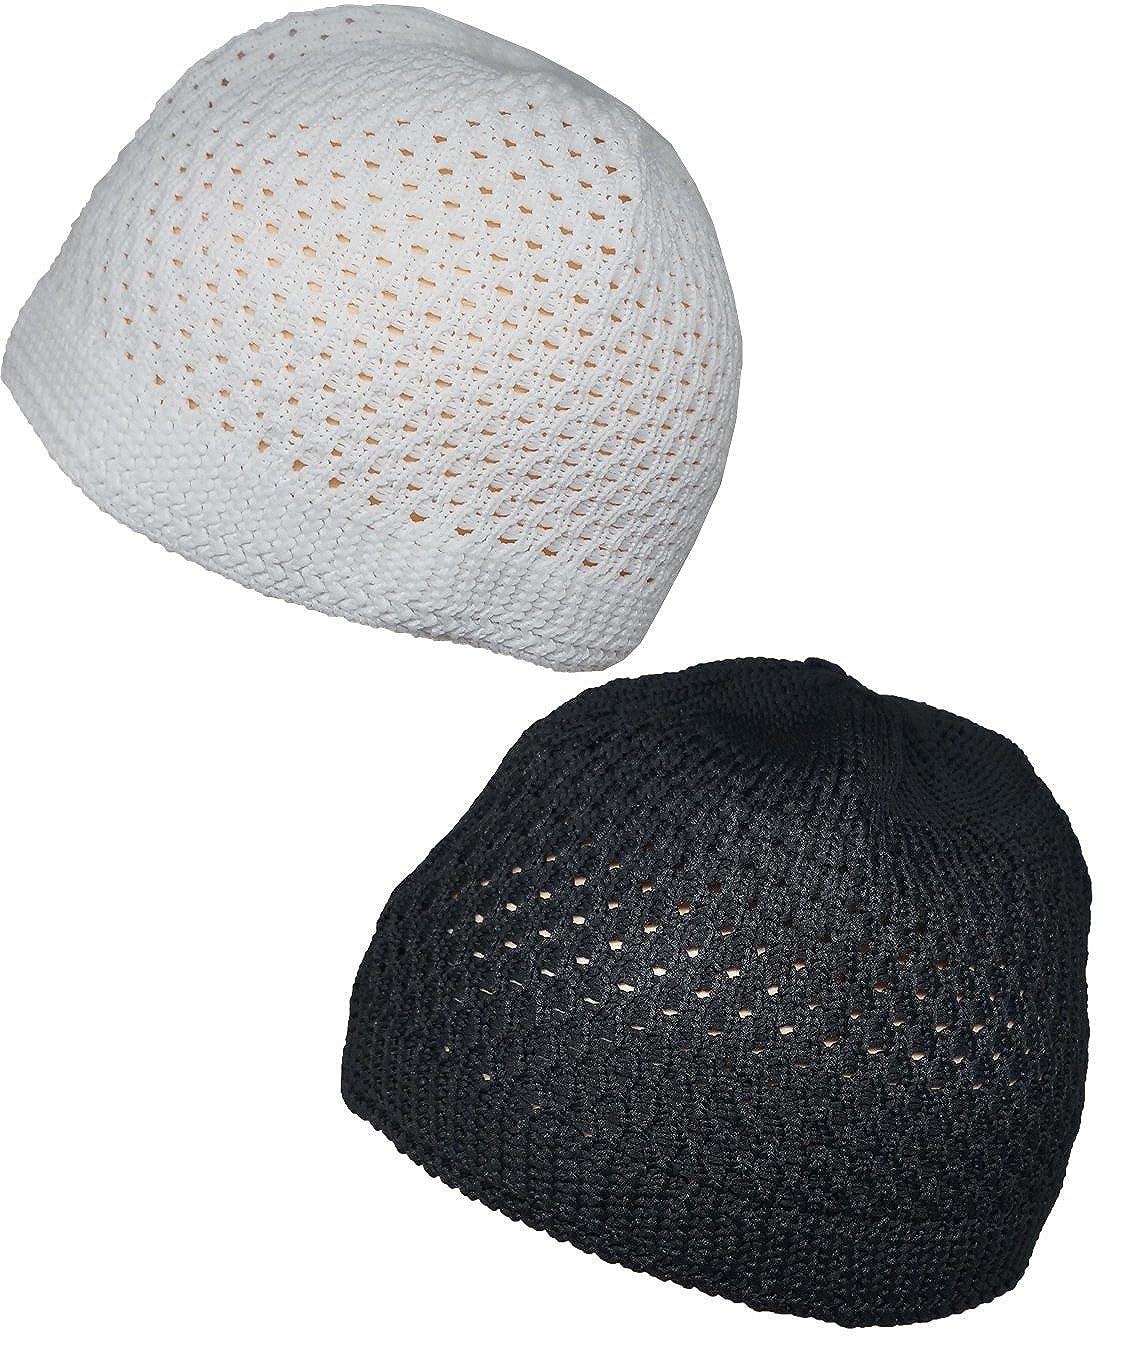 Set Black White Muslim Skull Cap Beanie Islam Crochet Takke Kufi Hat at  Amazon Men s Clothing store  60b2c90f962